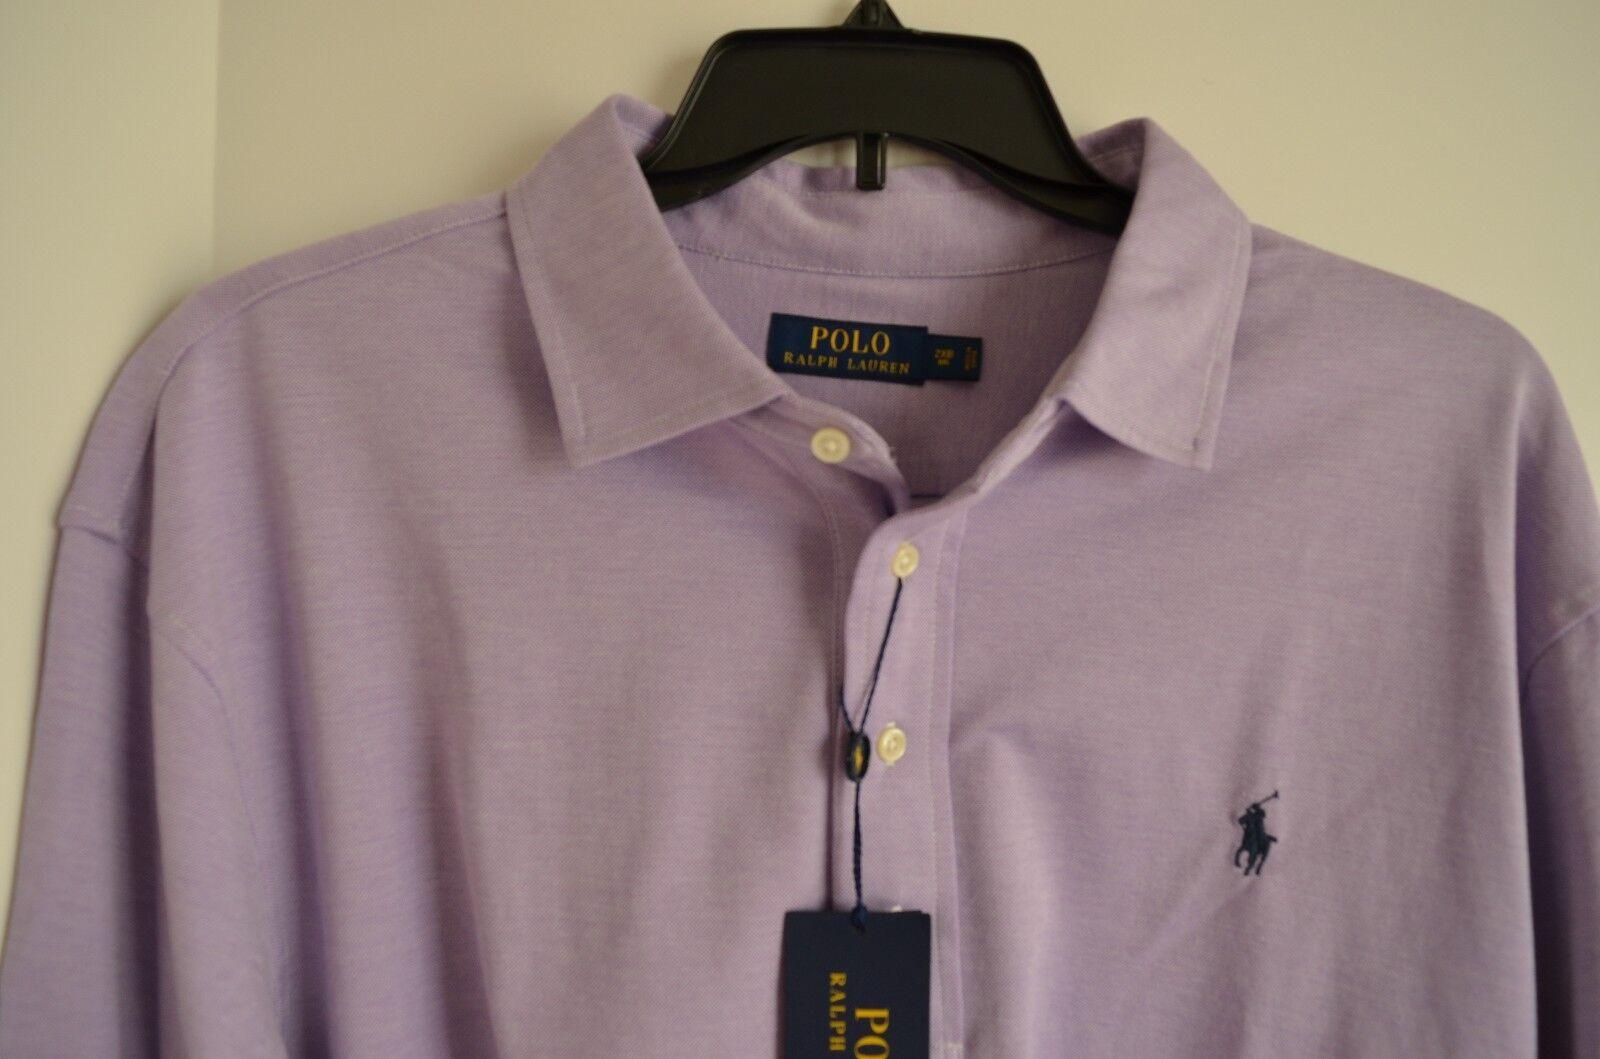 New Ralph Lauren POLO Men's PURPLE Long Sleeve Knit Shirt Size 2XB BIG NWT